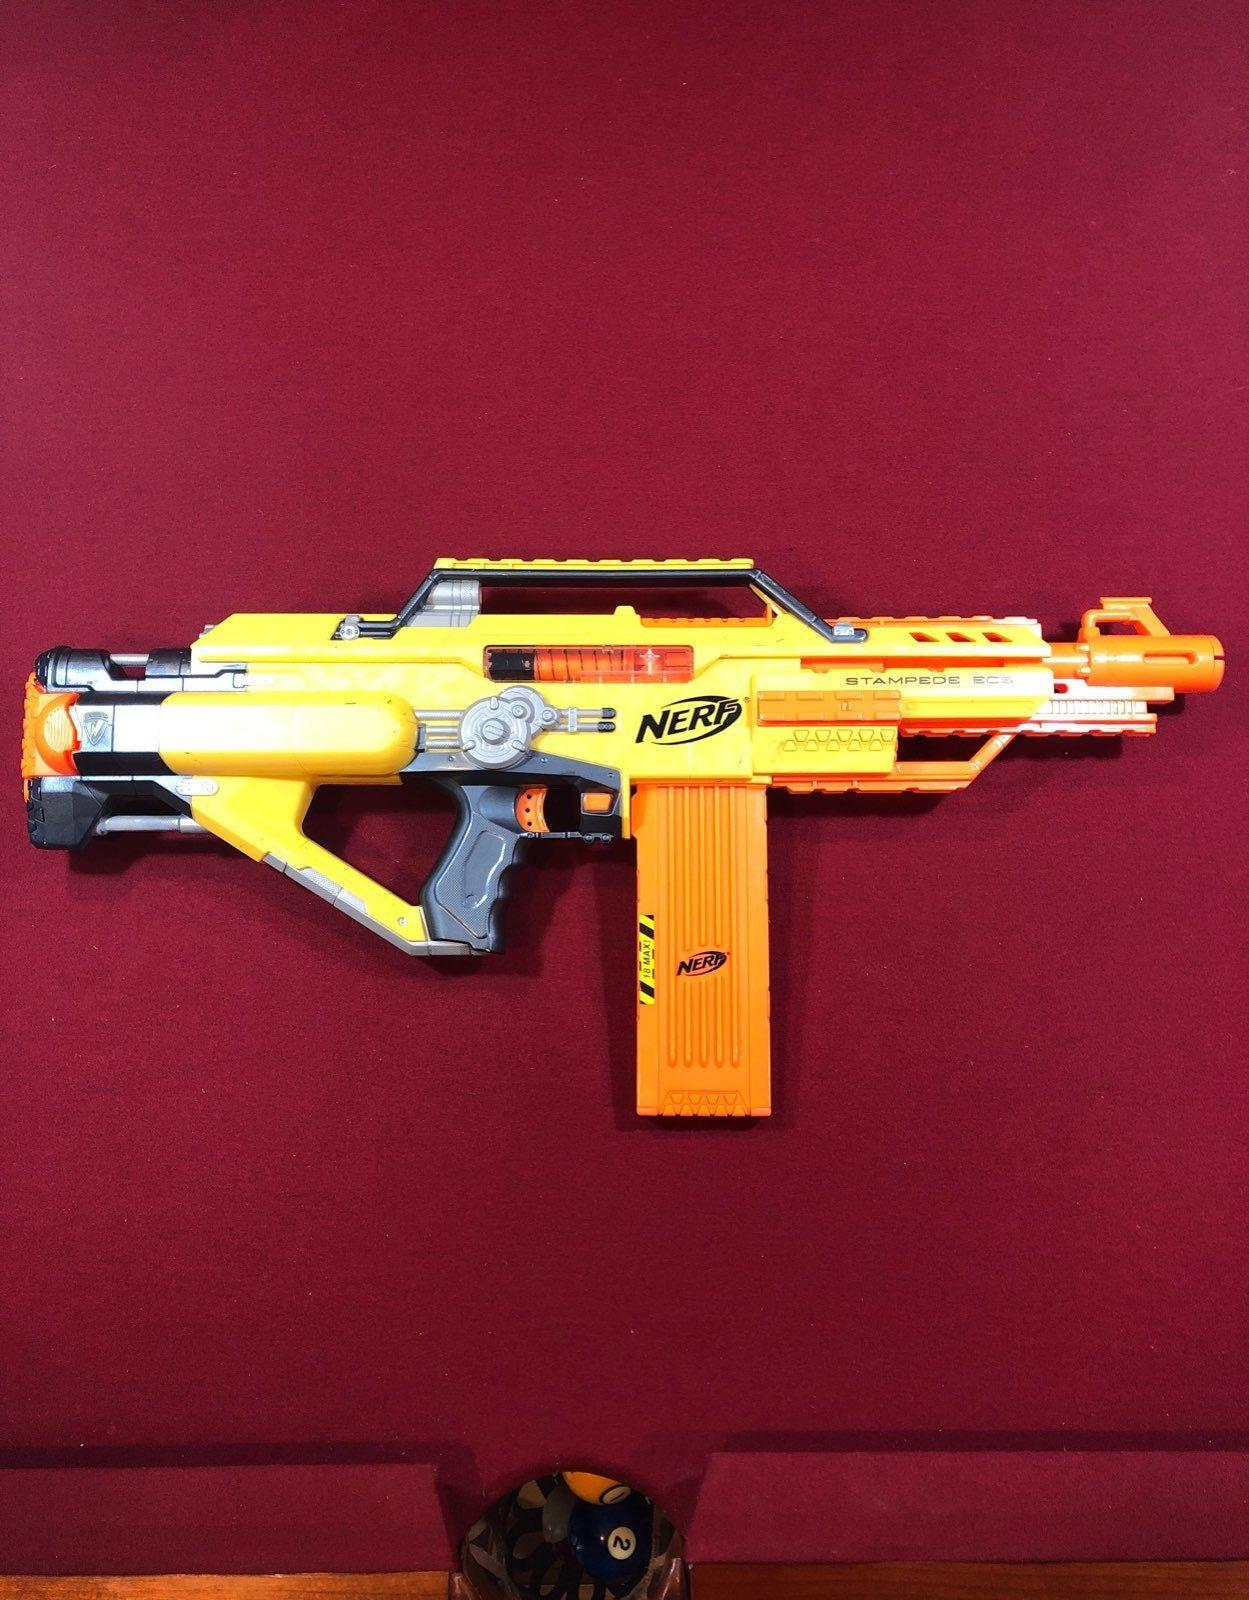 Pin on Nerf NERF & Blaster Guns